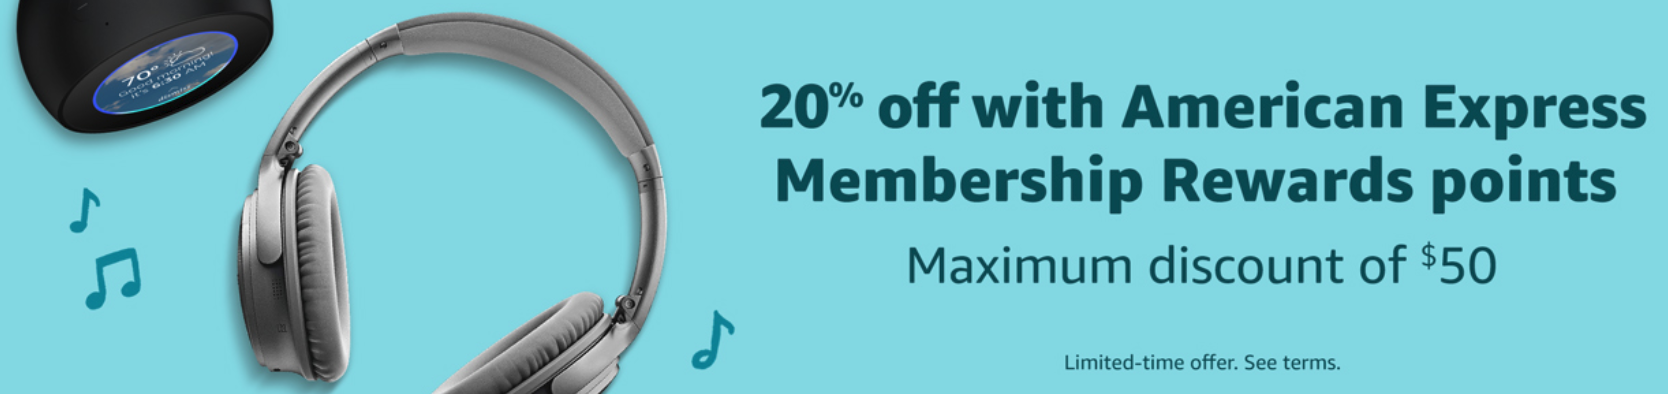 save 20% at Amazon by using American Express Membership Rewards Points.